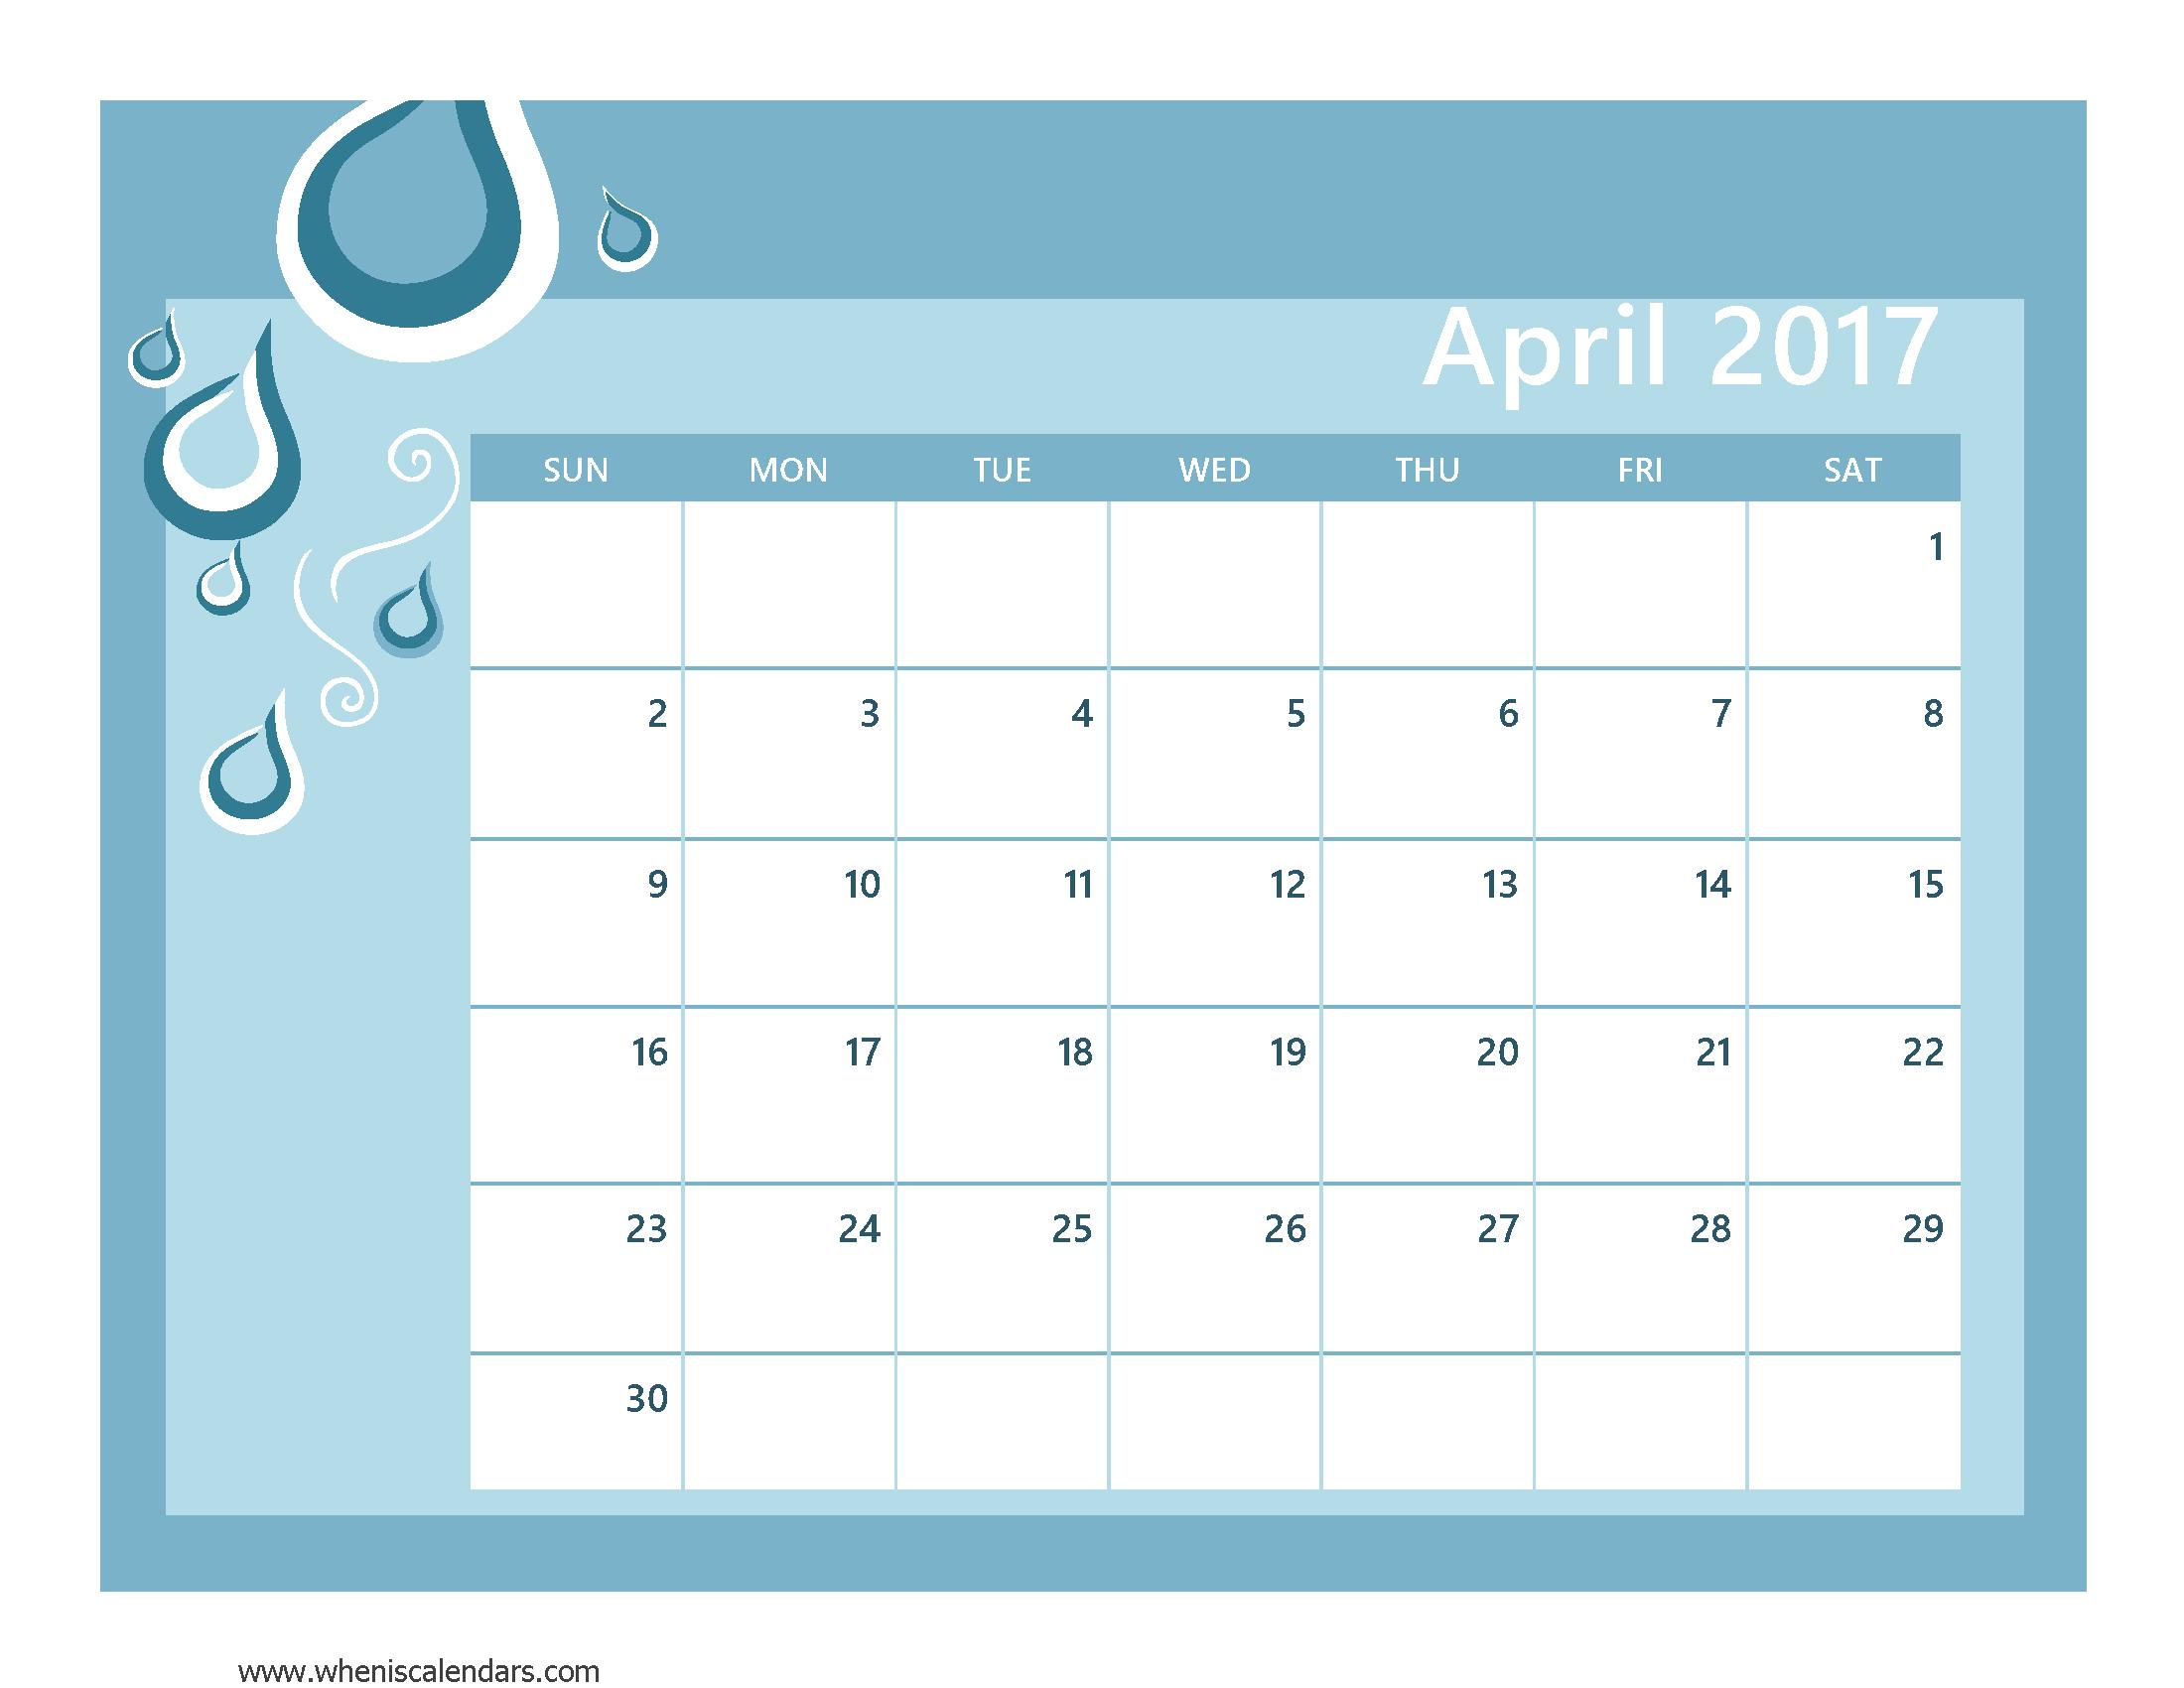 April 2017 Calendar Printable With Holidays | weekly calendar template